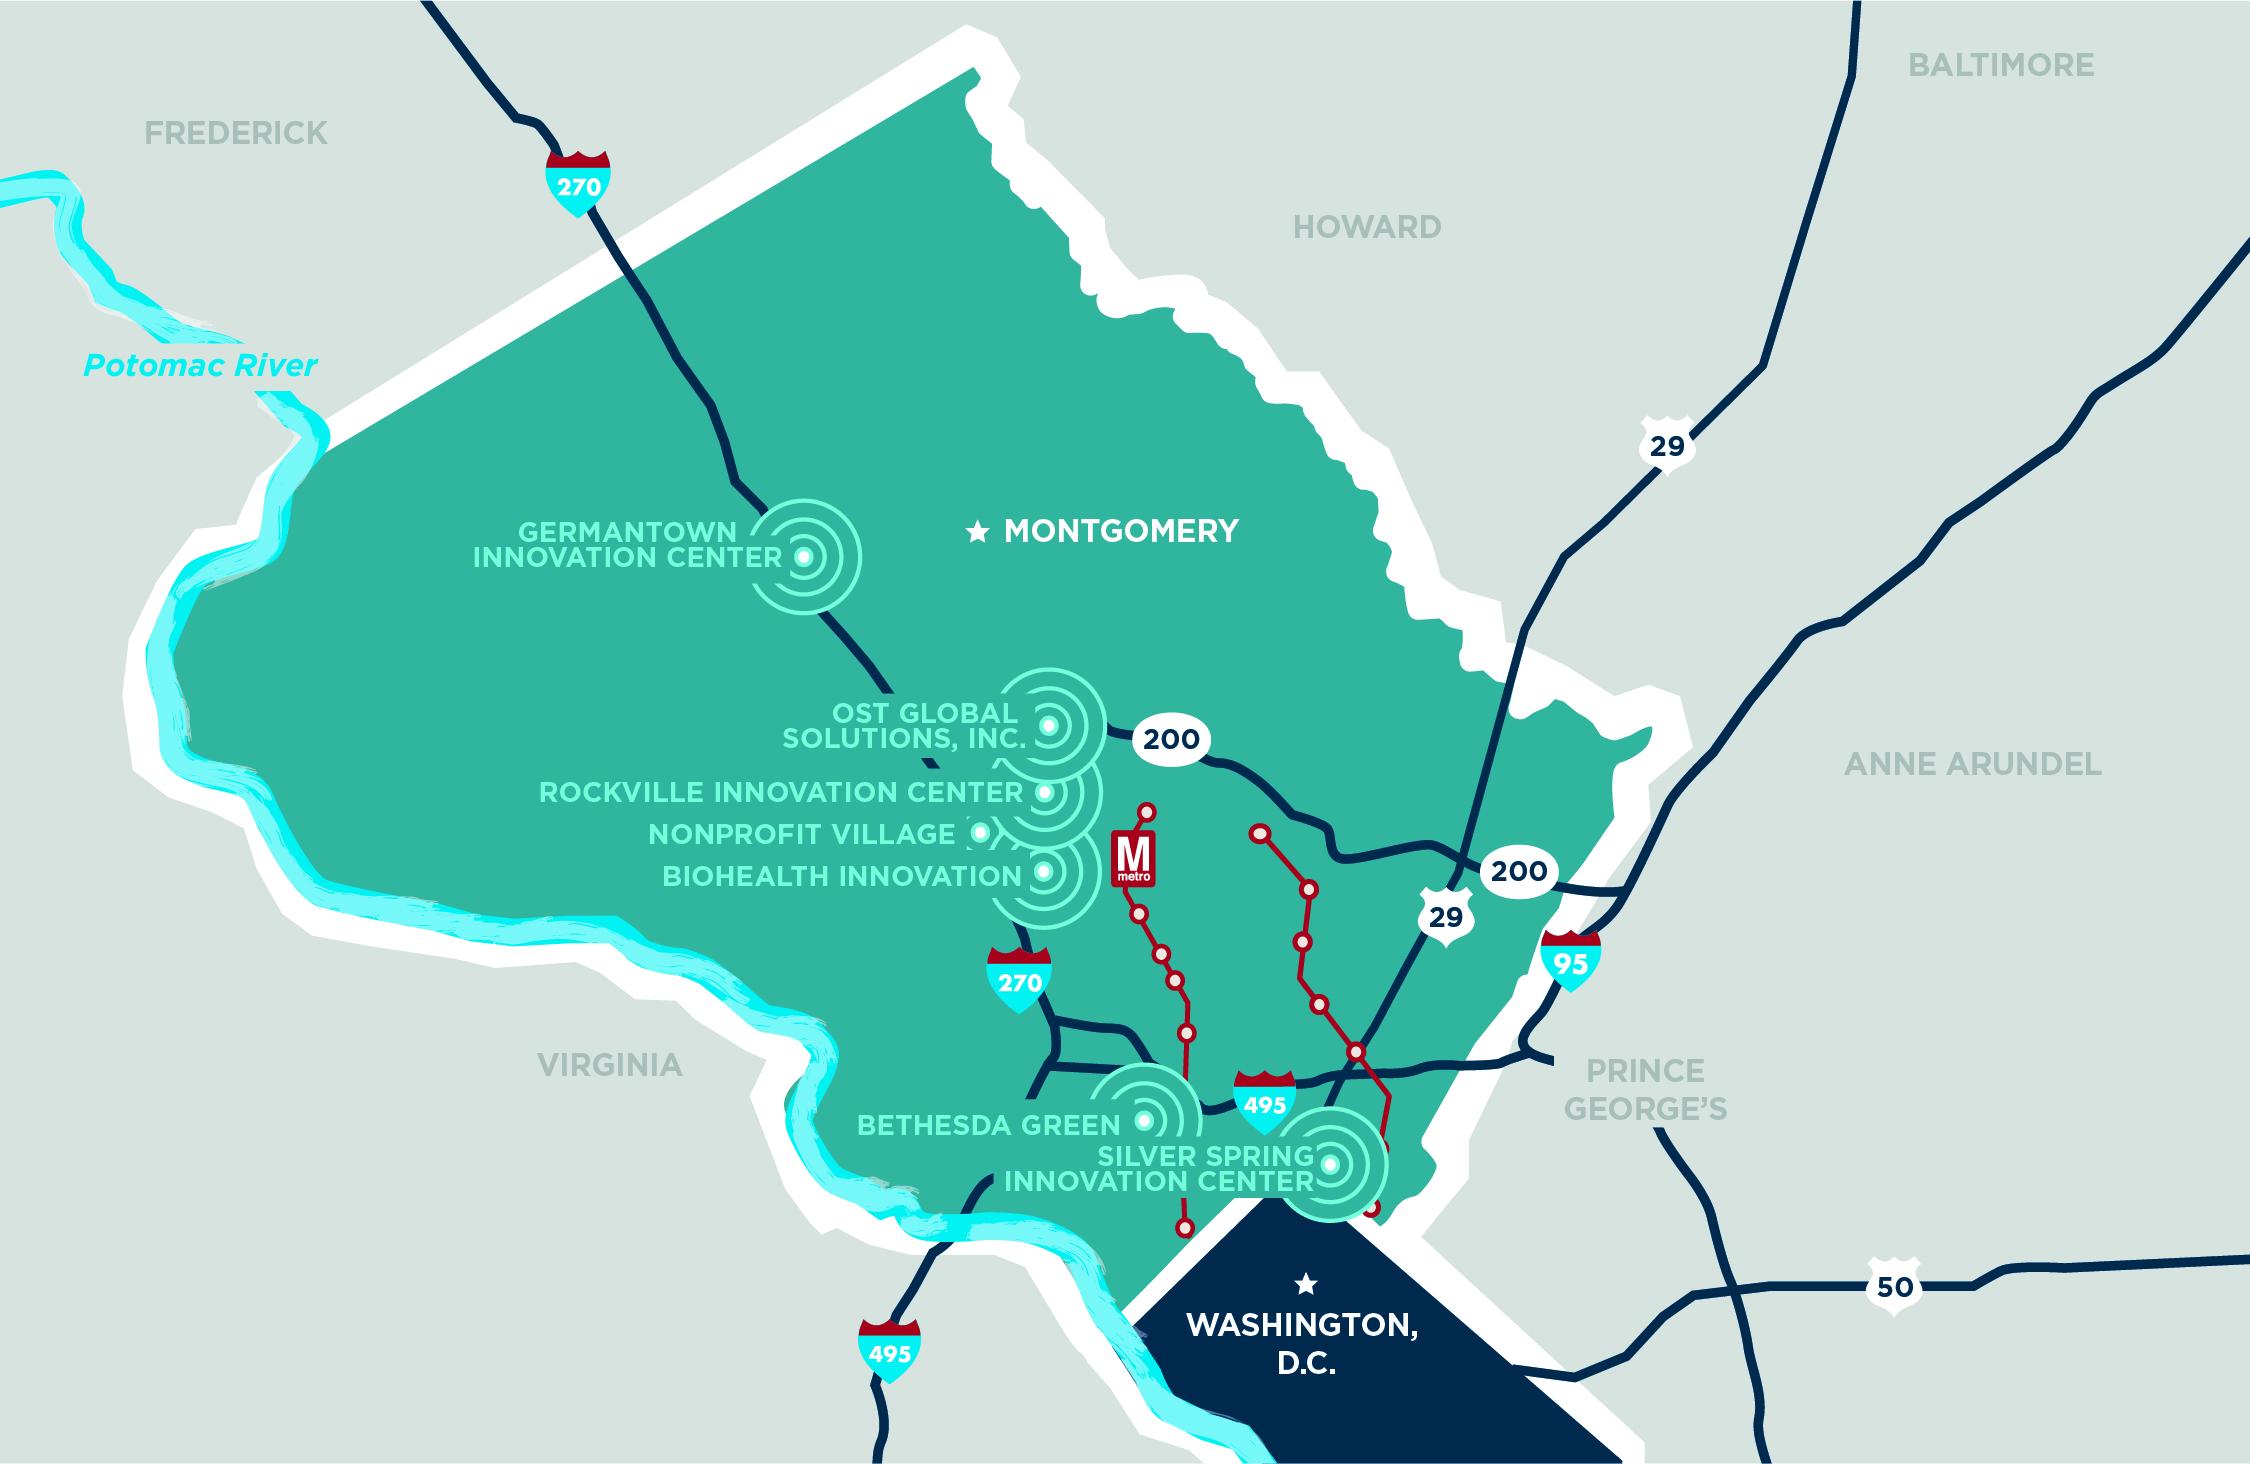 MAP_InnovationCenters4.jpg